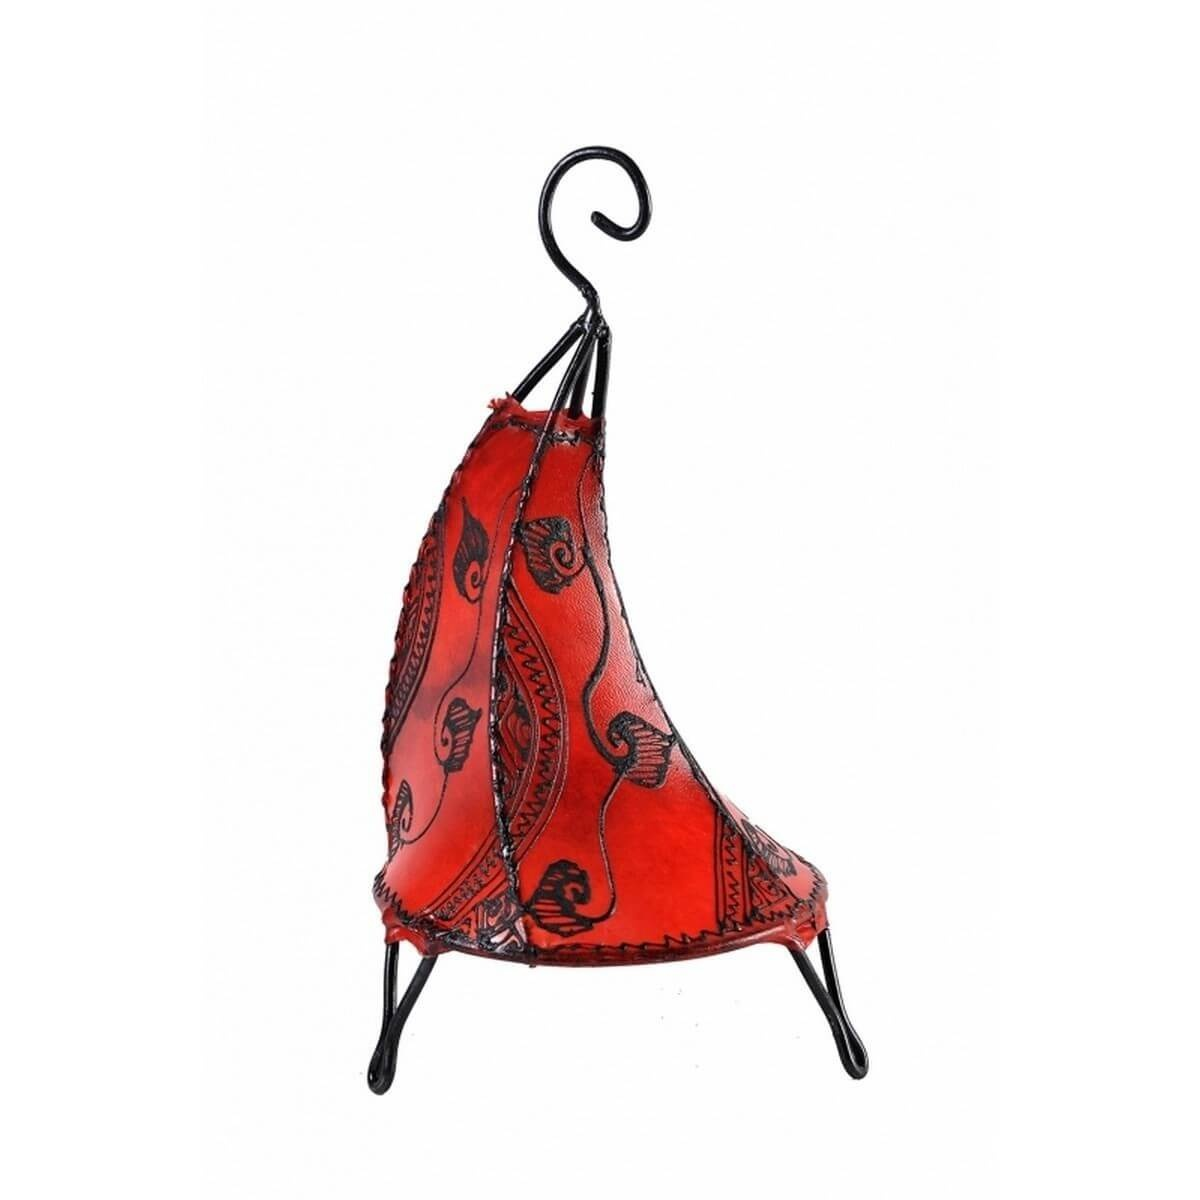 orientalische marokkanische stehlampe leder lampe hennalampe lederleuchte tisirr ebay. Black Bedroom Furniture Sets. Home Design Ideas